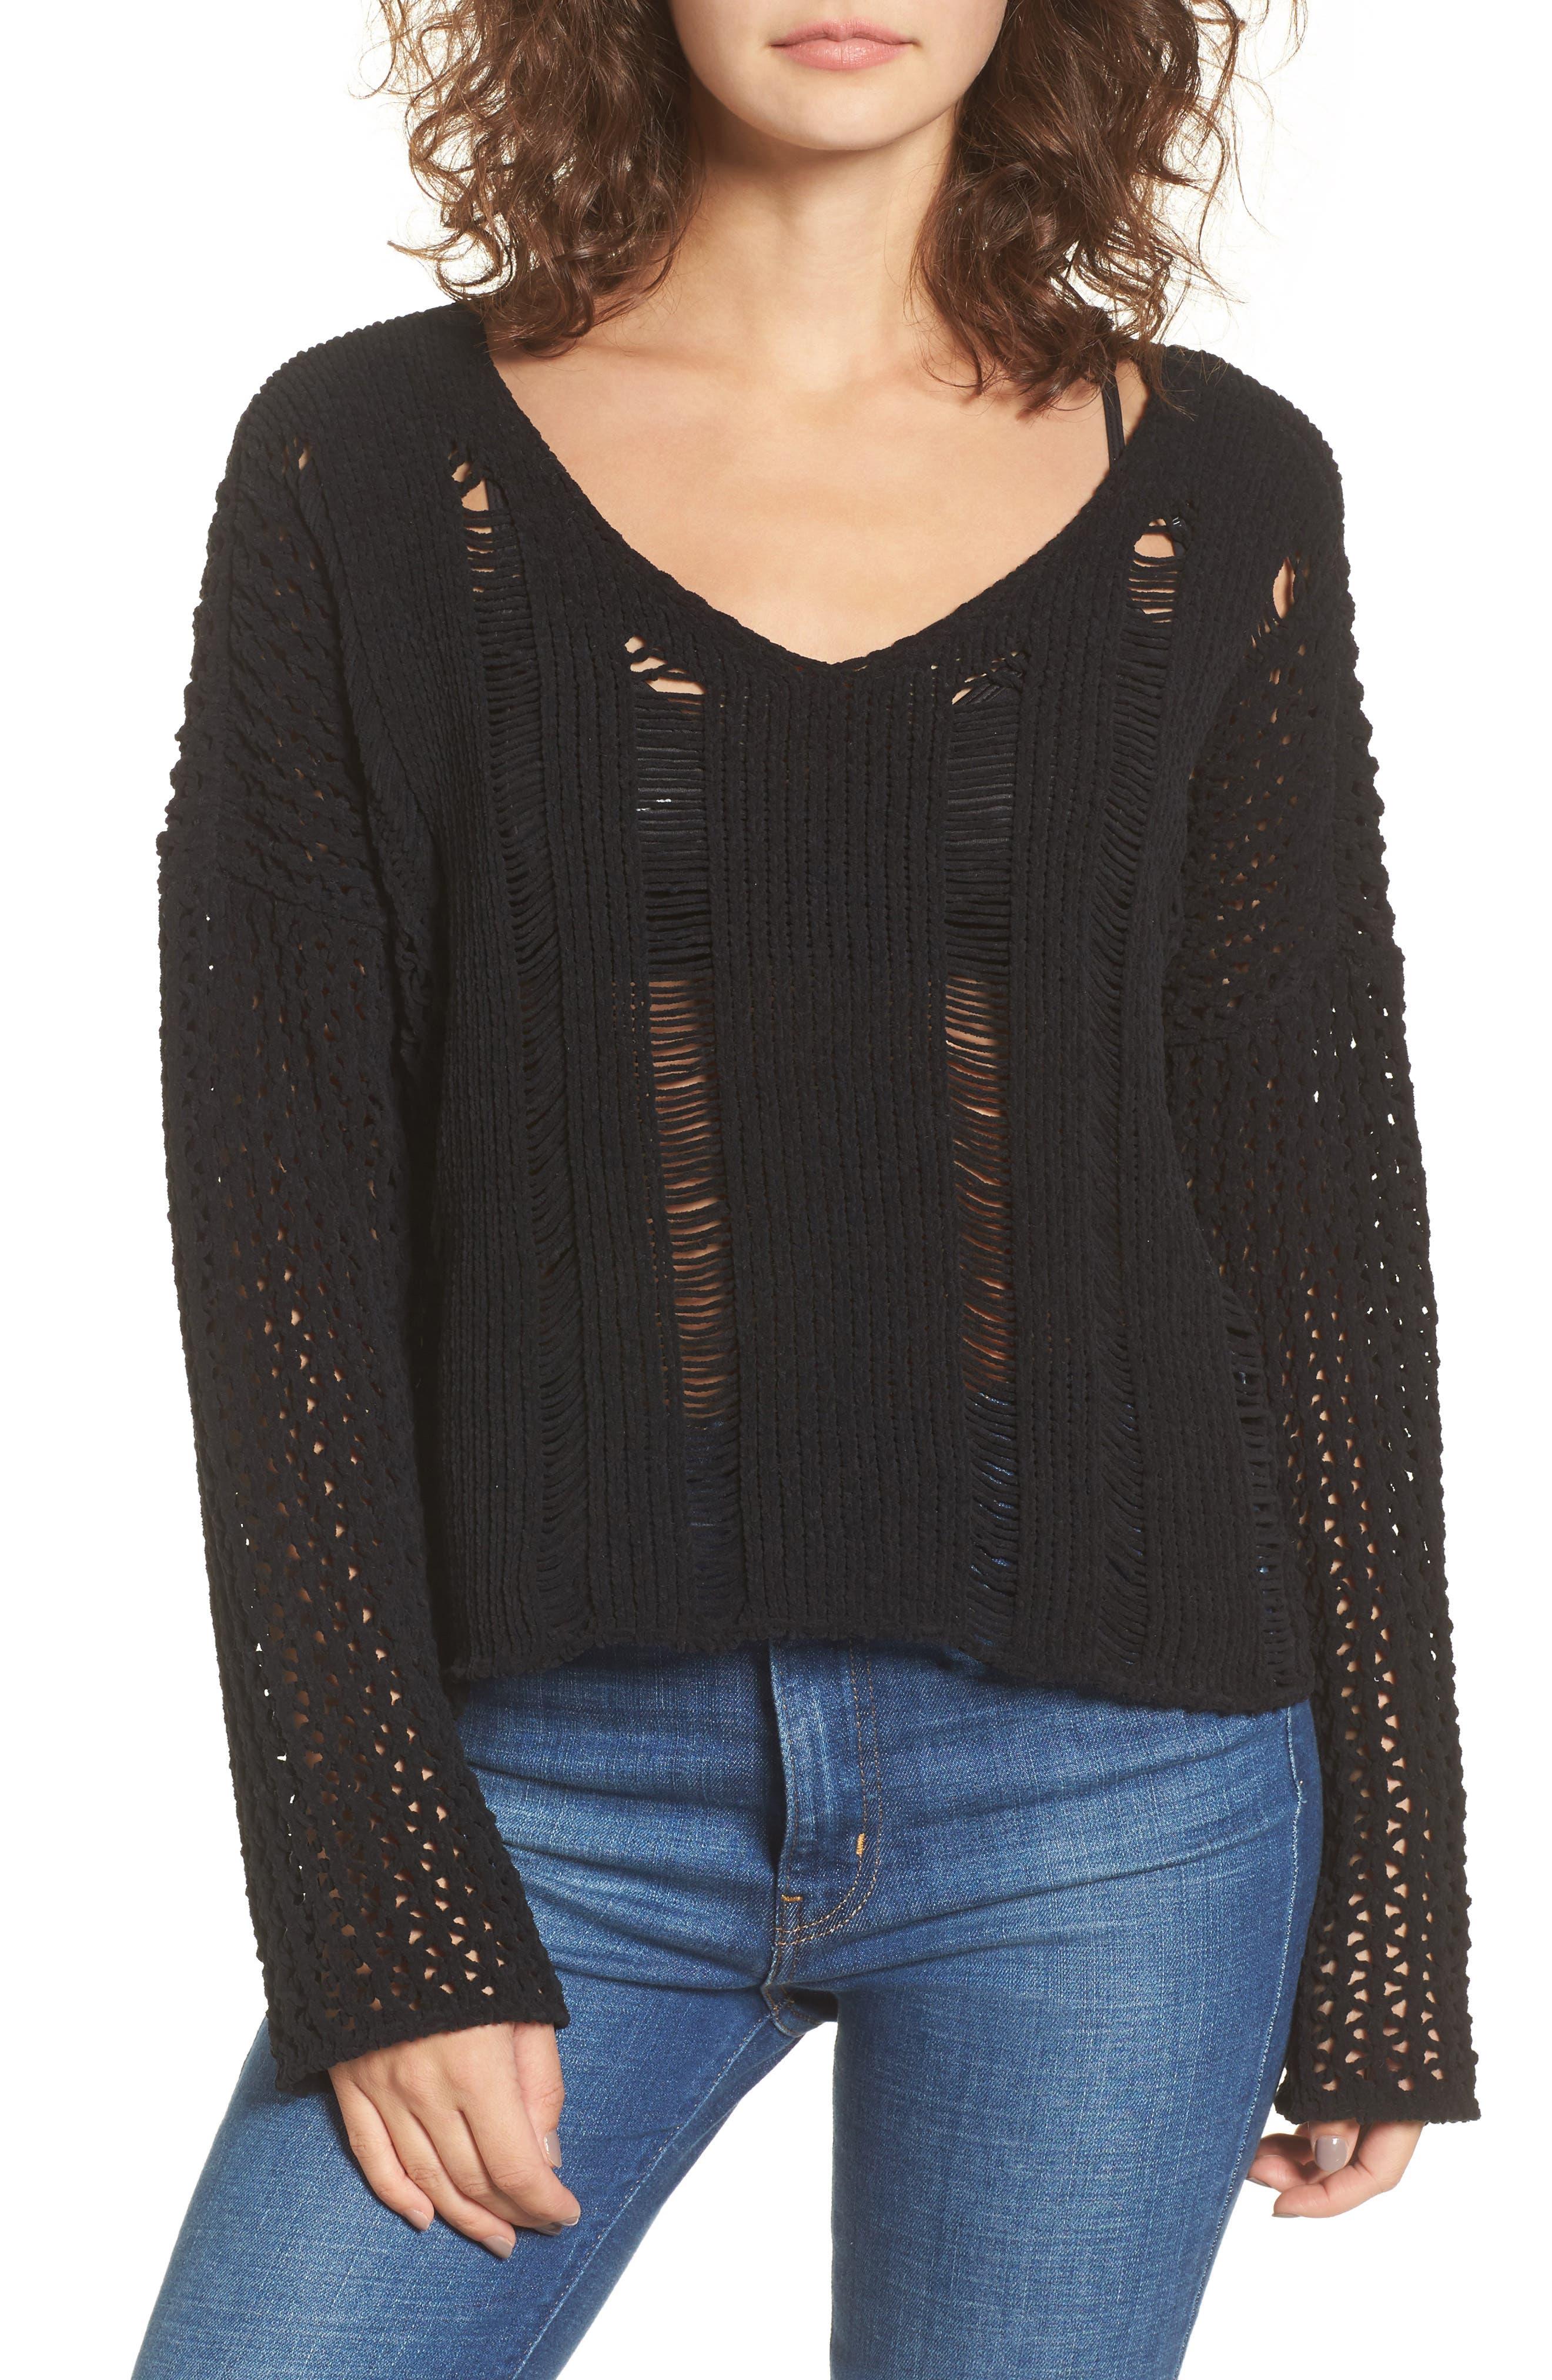 Alternate Image 1 Selected - MOON RIVER Net Detail Sweater